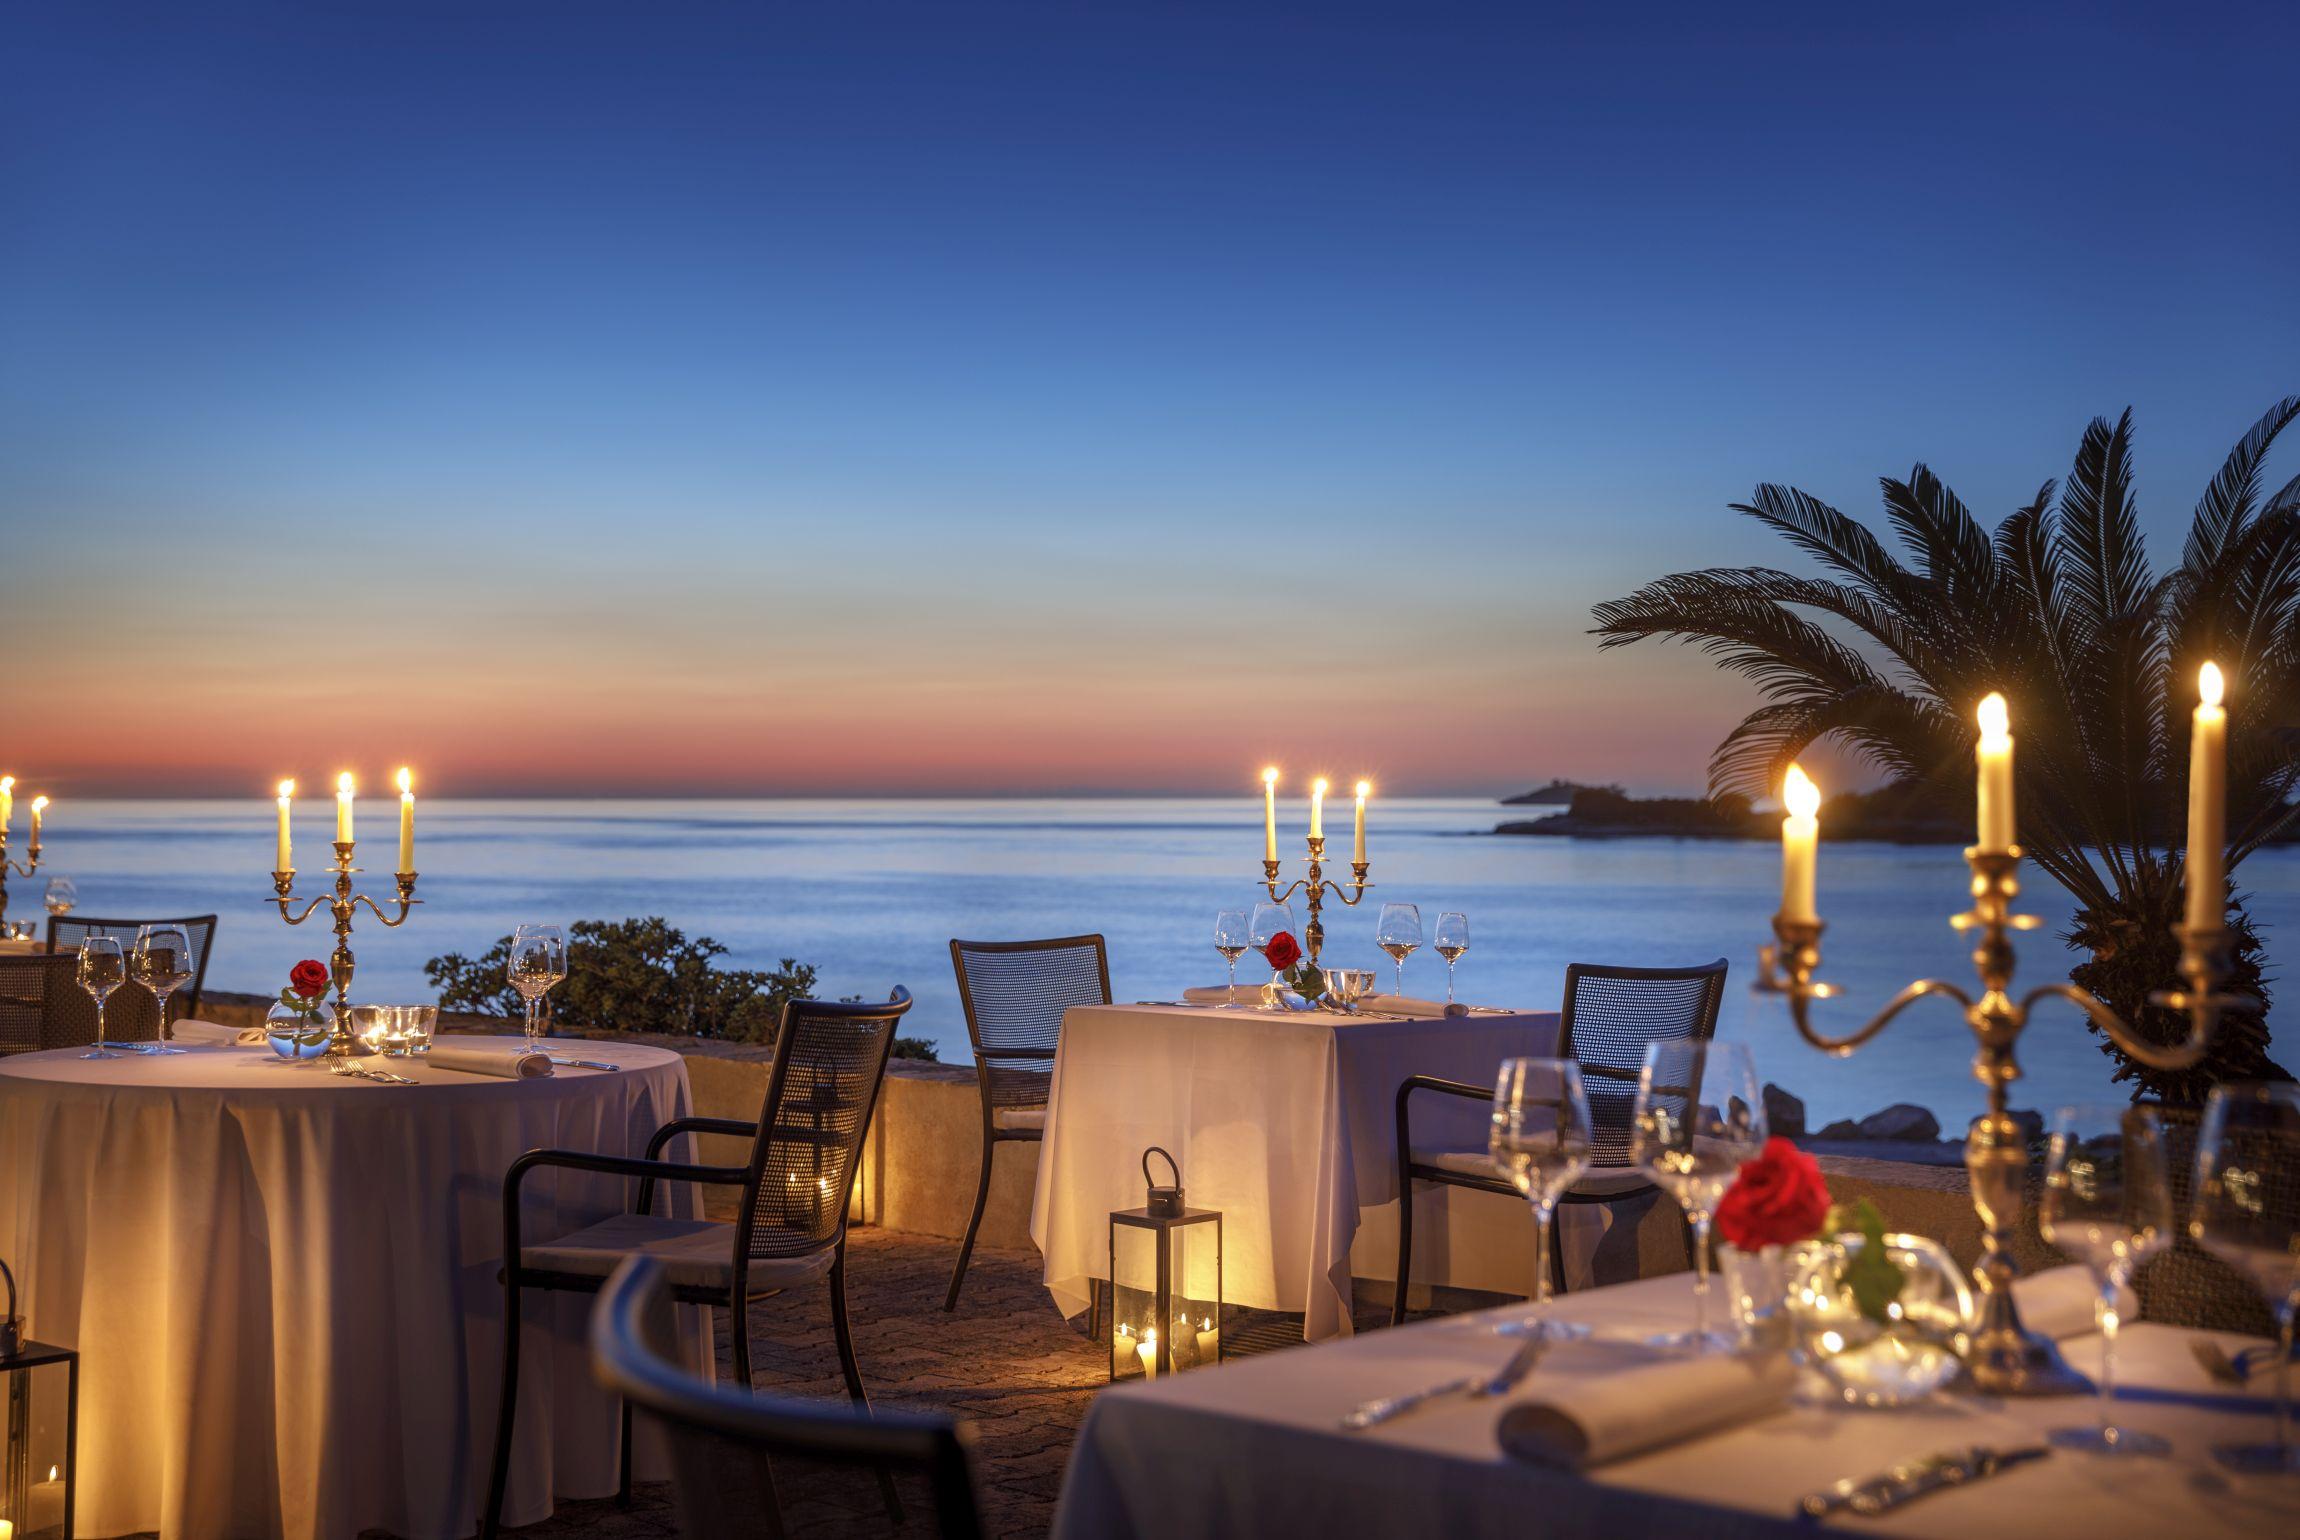 Hotel Istra (15)